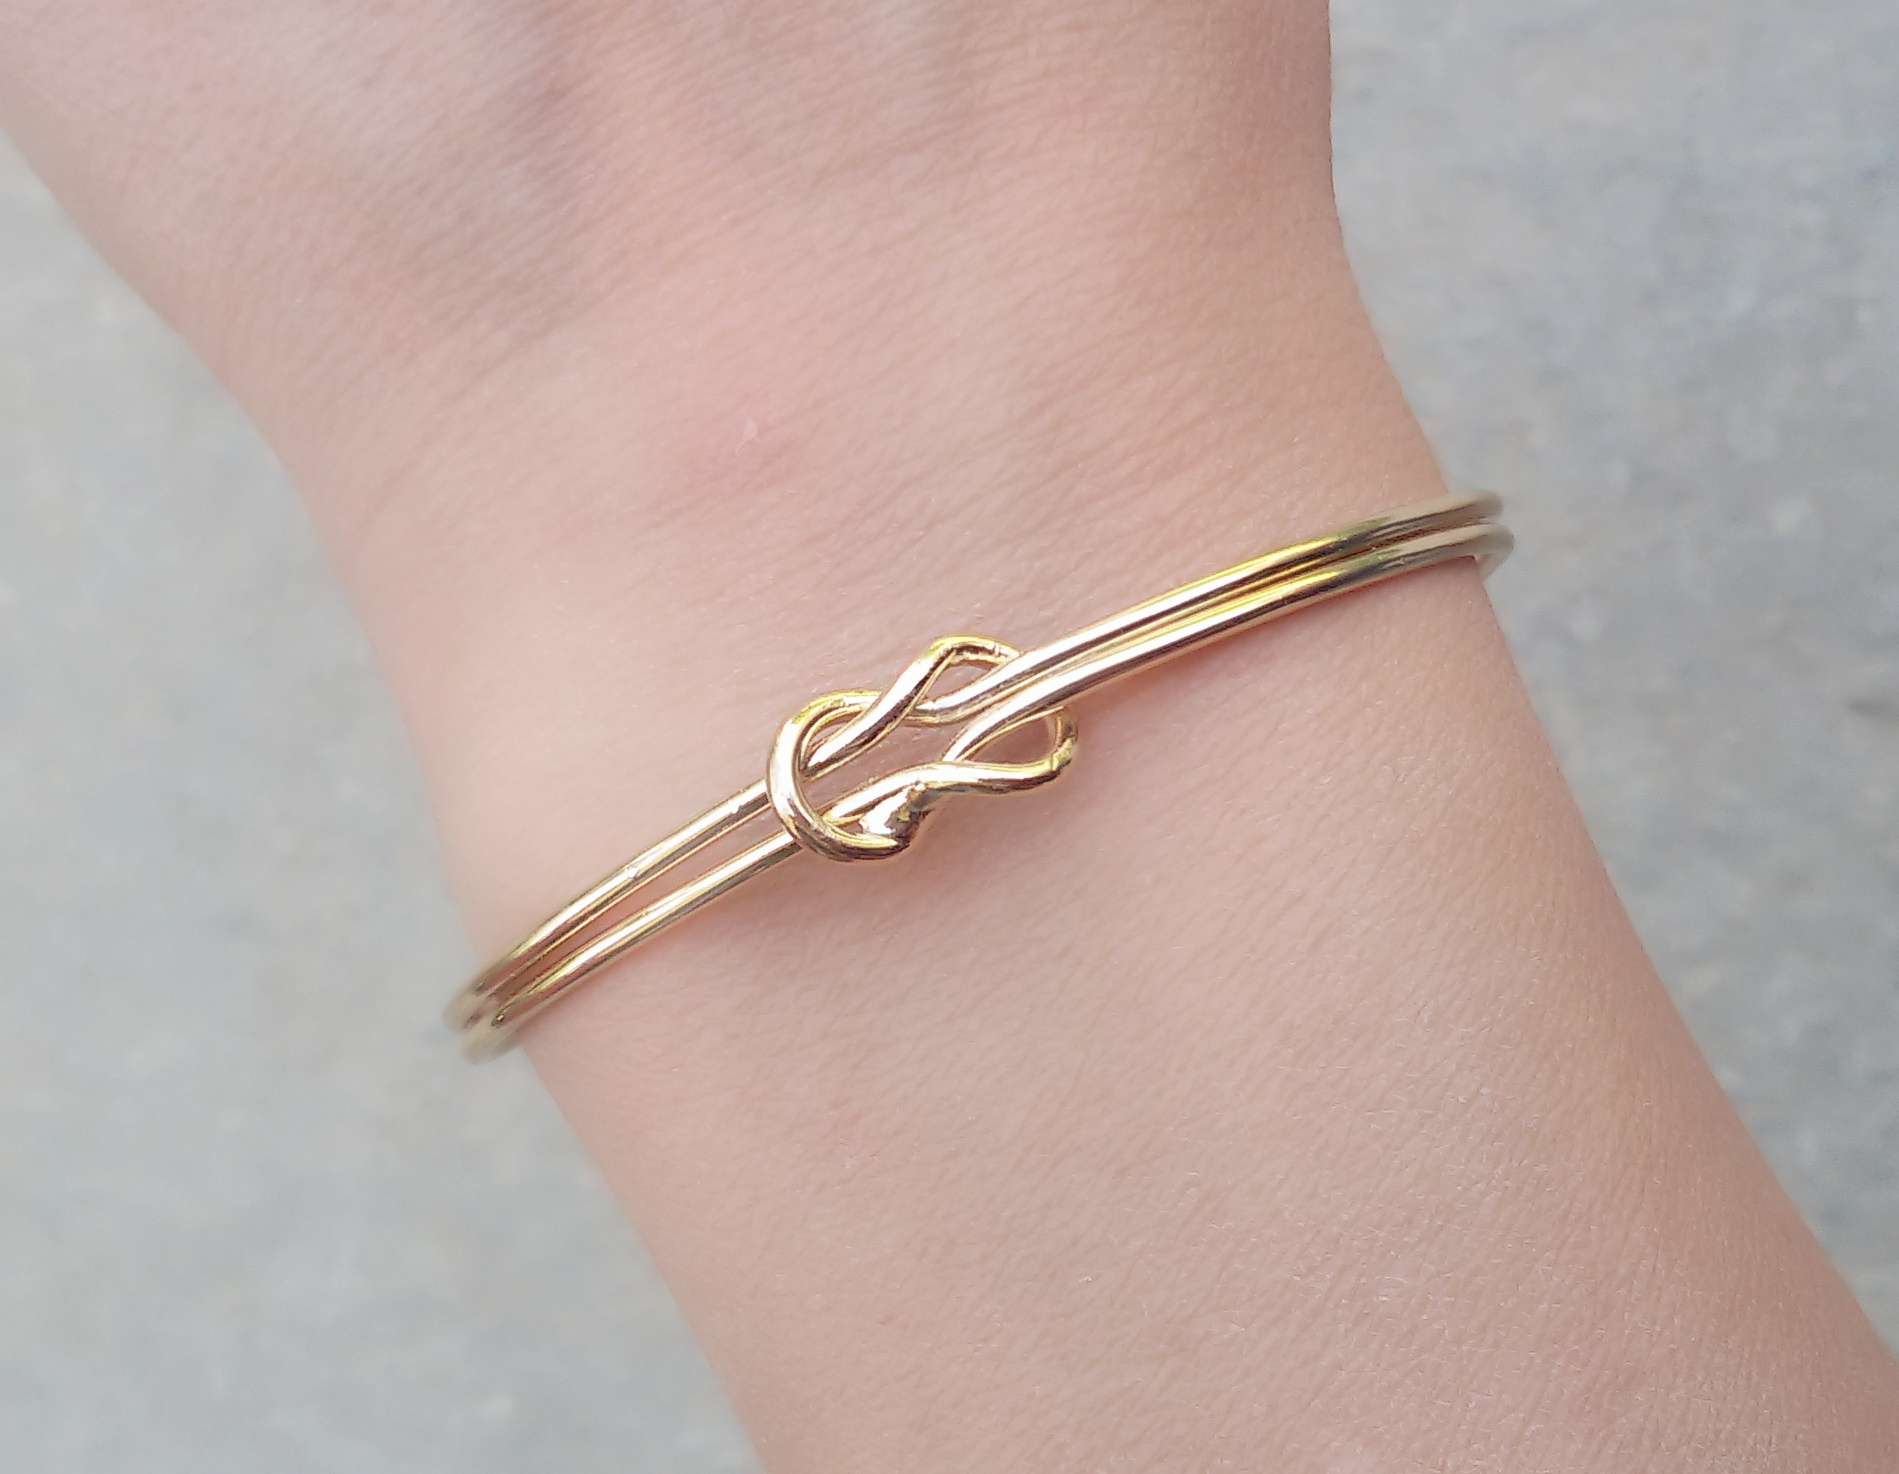 bracelet double noeud or.Idees cadeaux bijoux femme. Bijoux tendance 2017. Bracelet  tendance